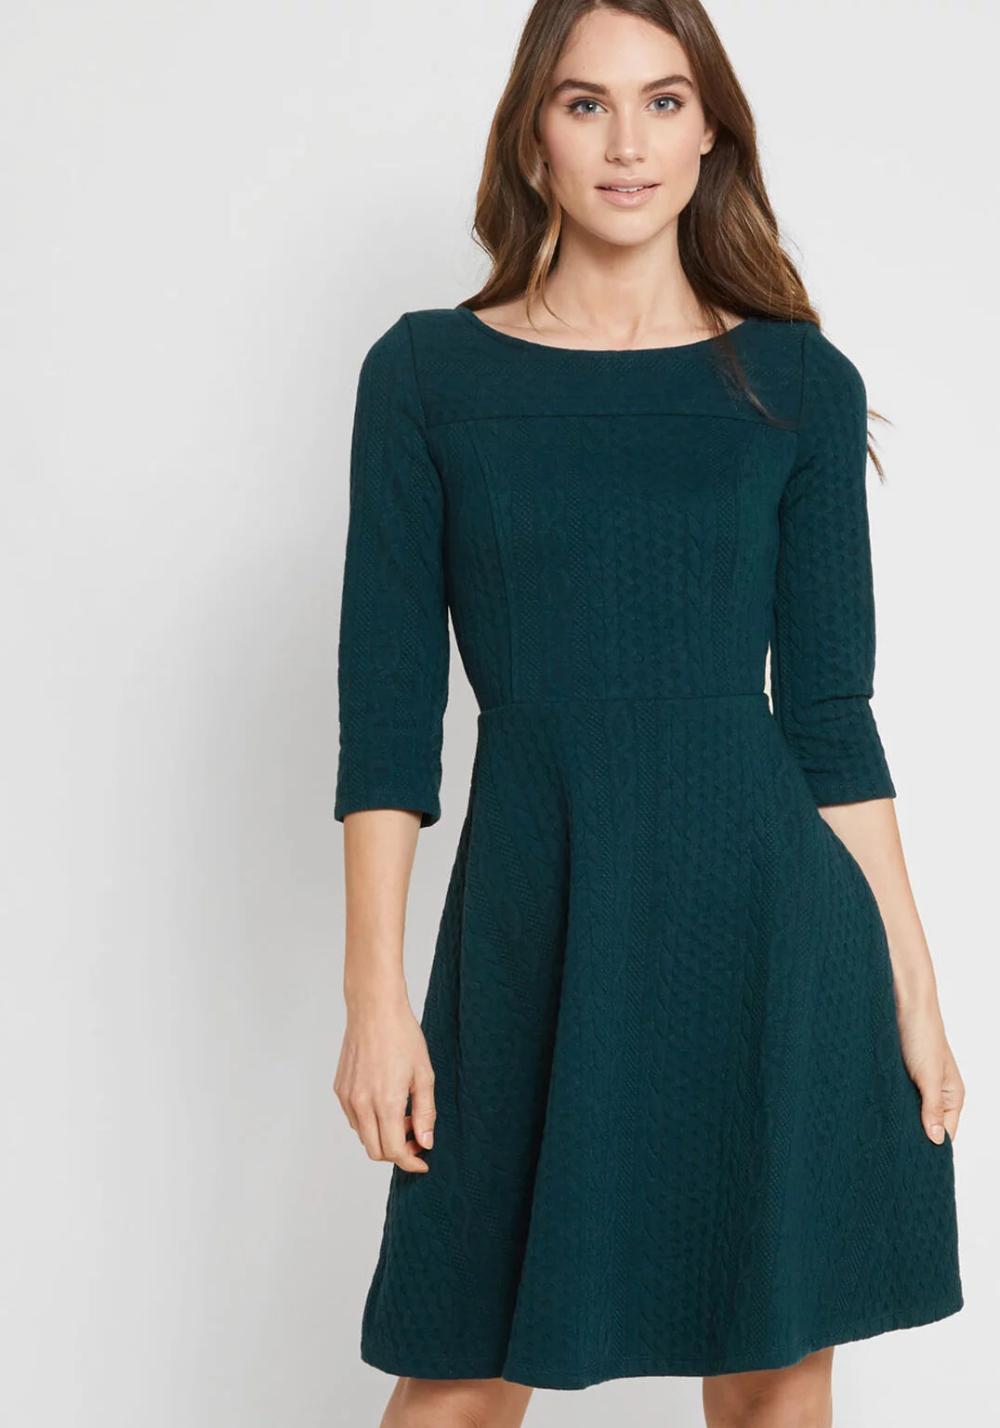 50++ 34 sleeve dress ideas